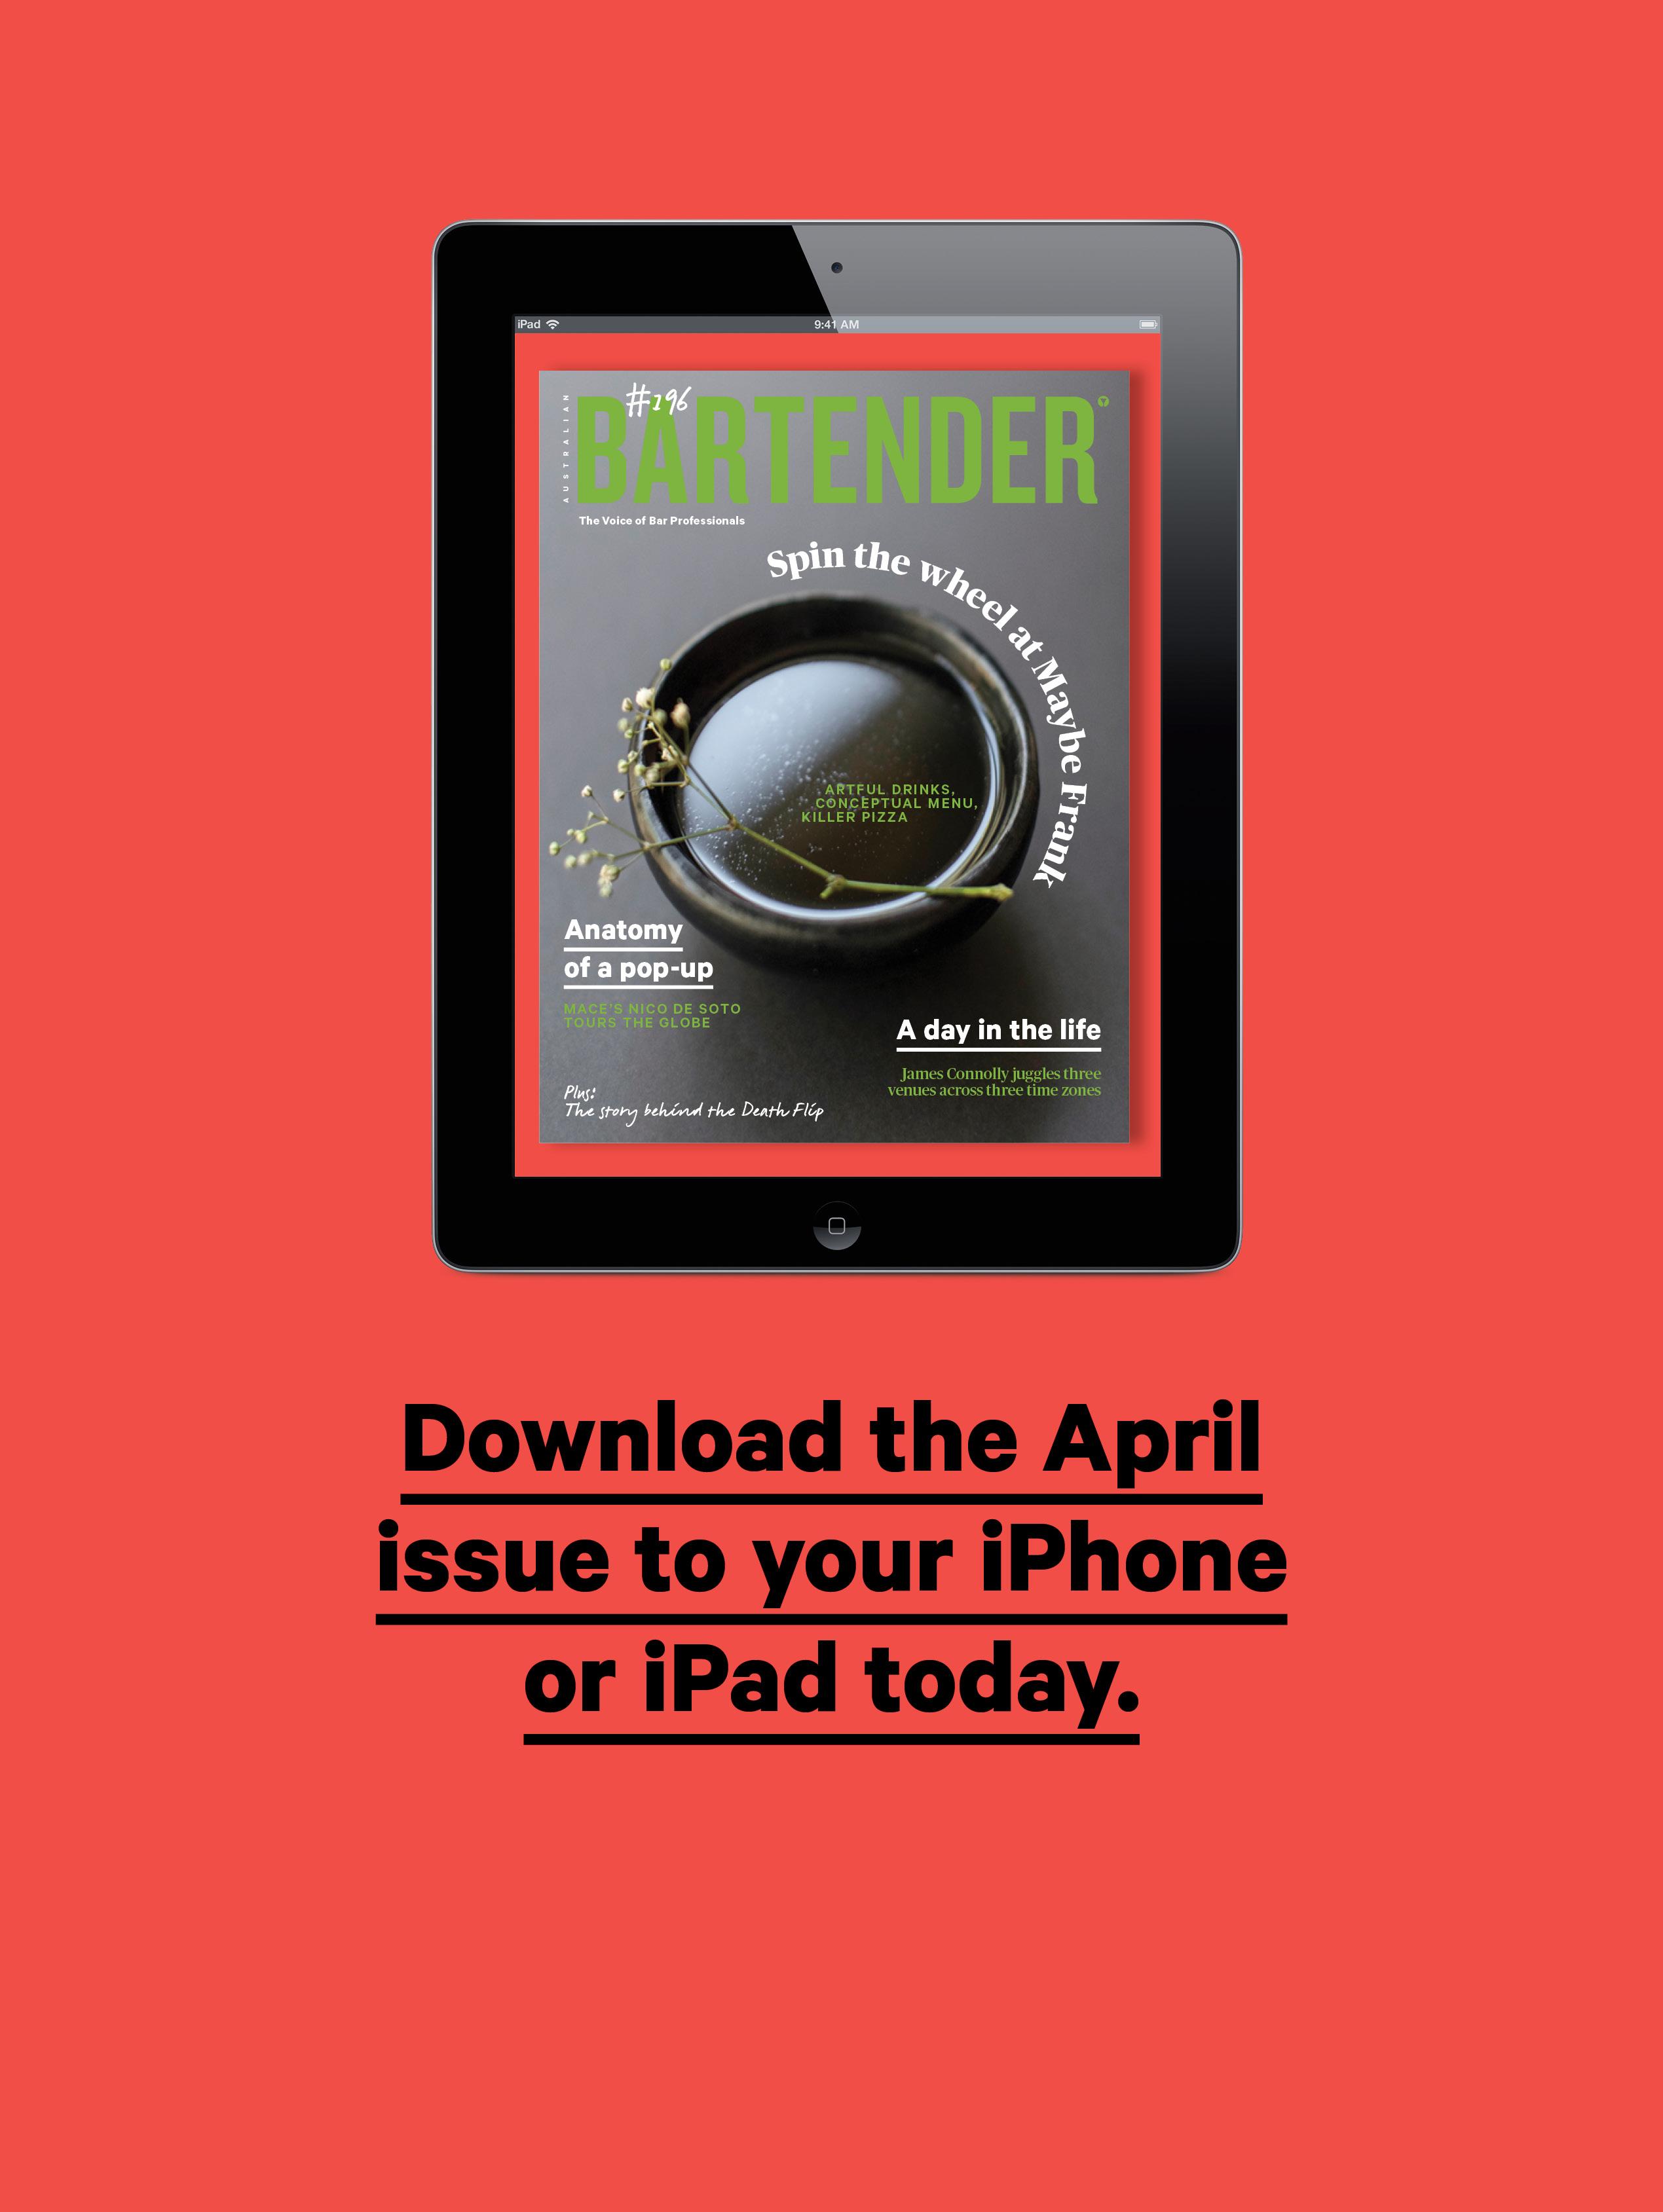 April Issue ipad